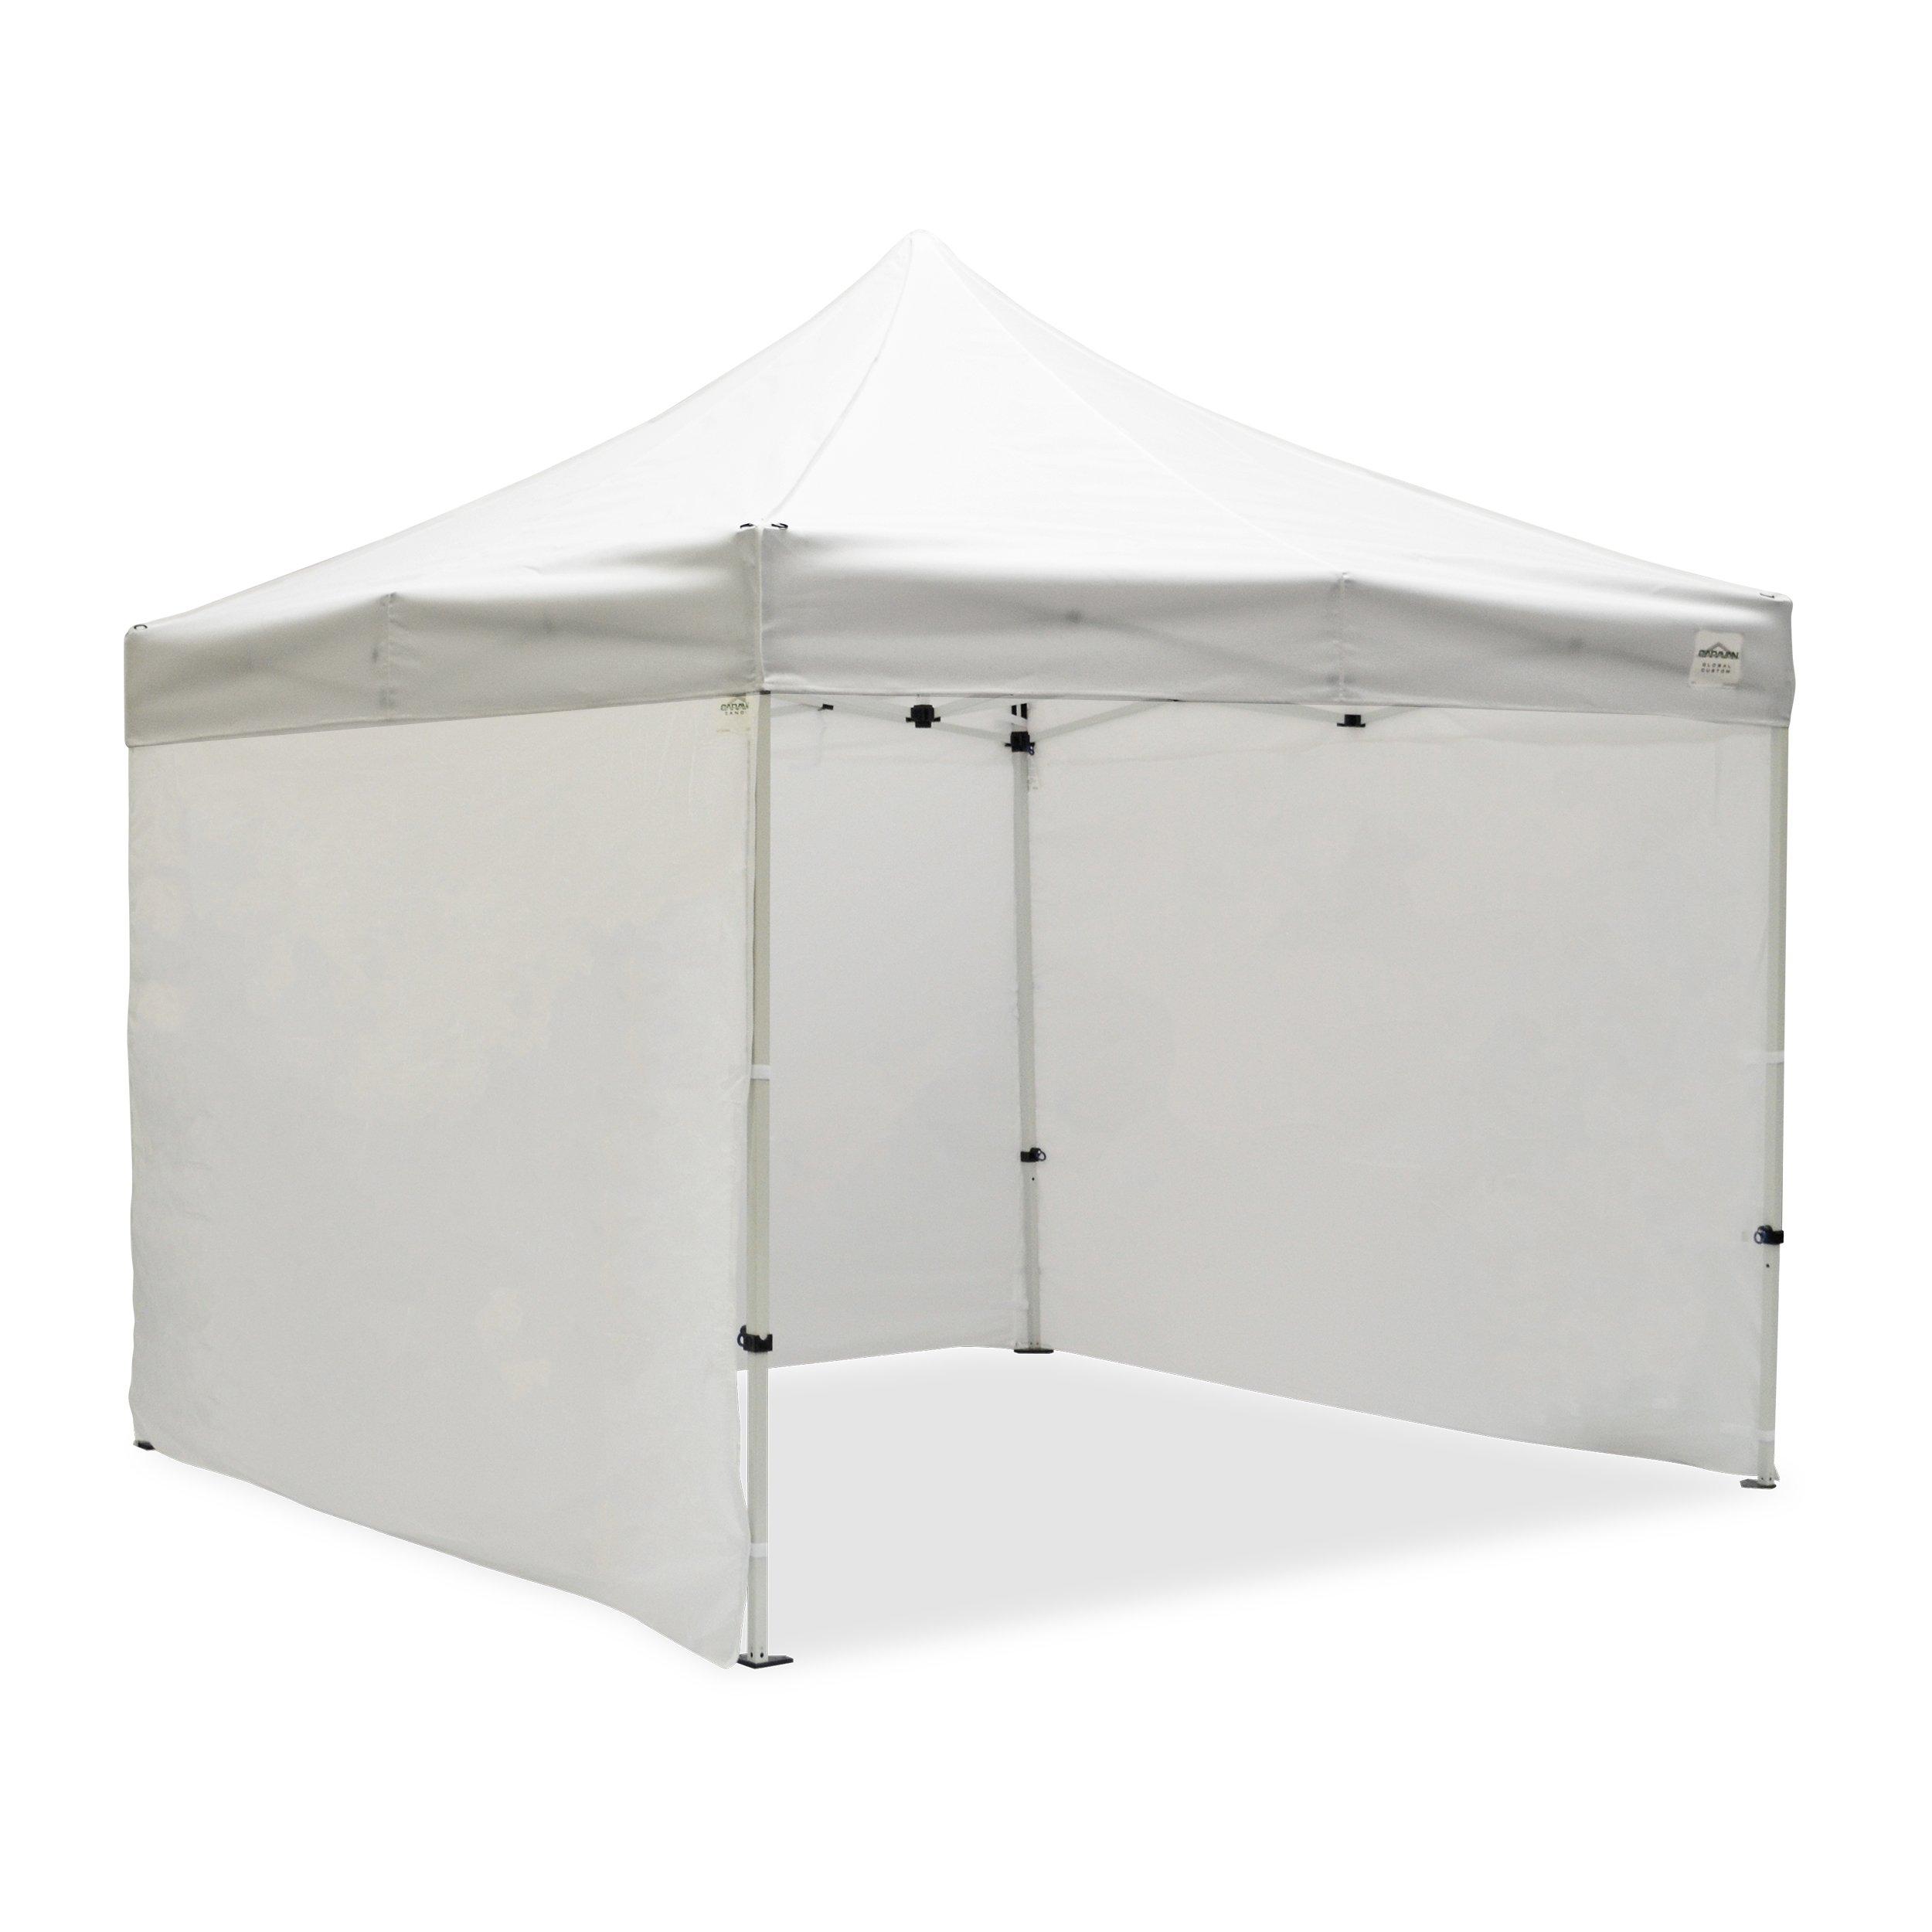 Caravan Canopy Sports Commercial Grade Sidewalls, 10 x 10-Feet